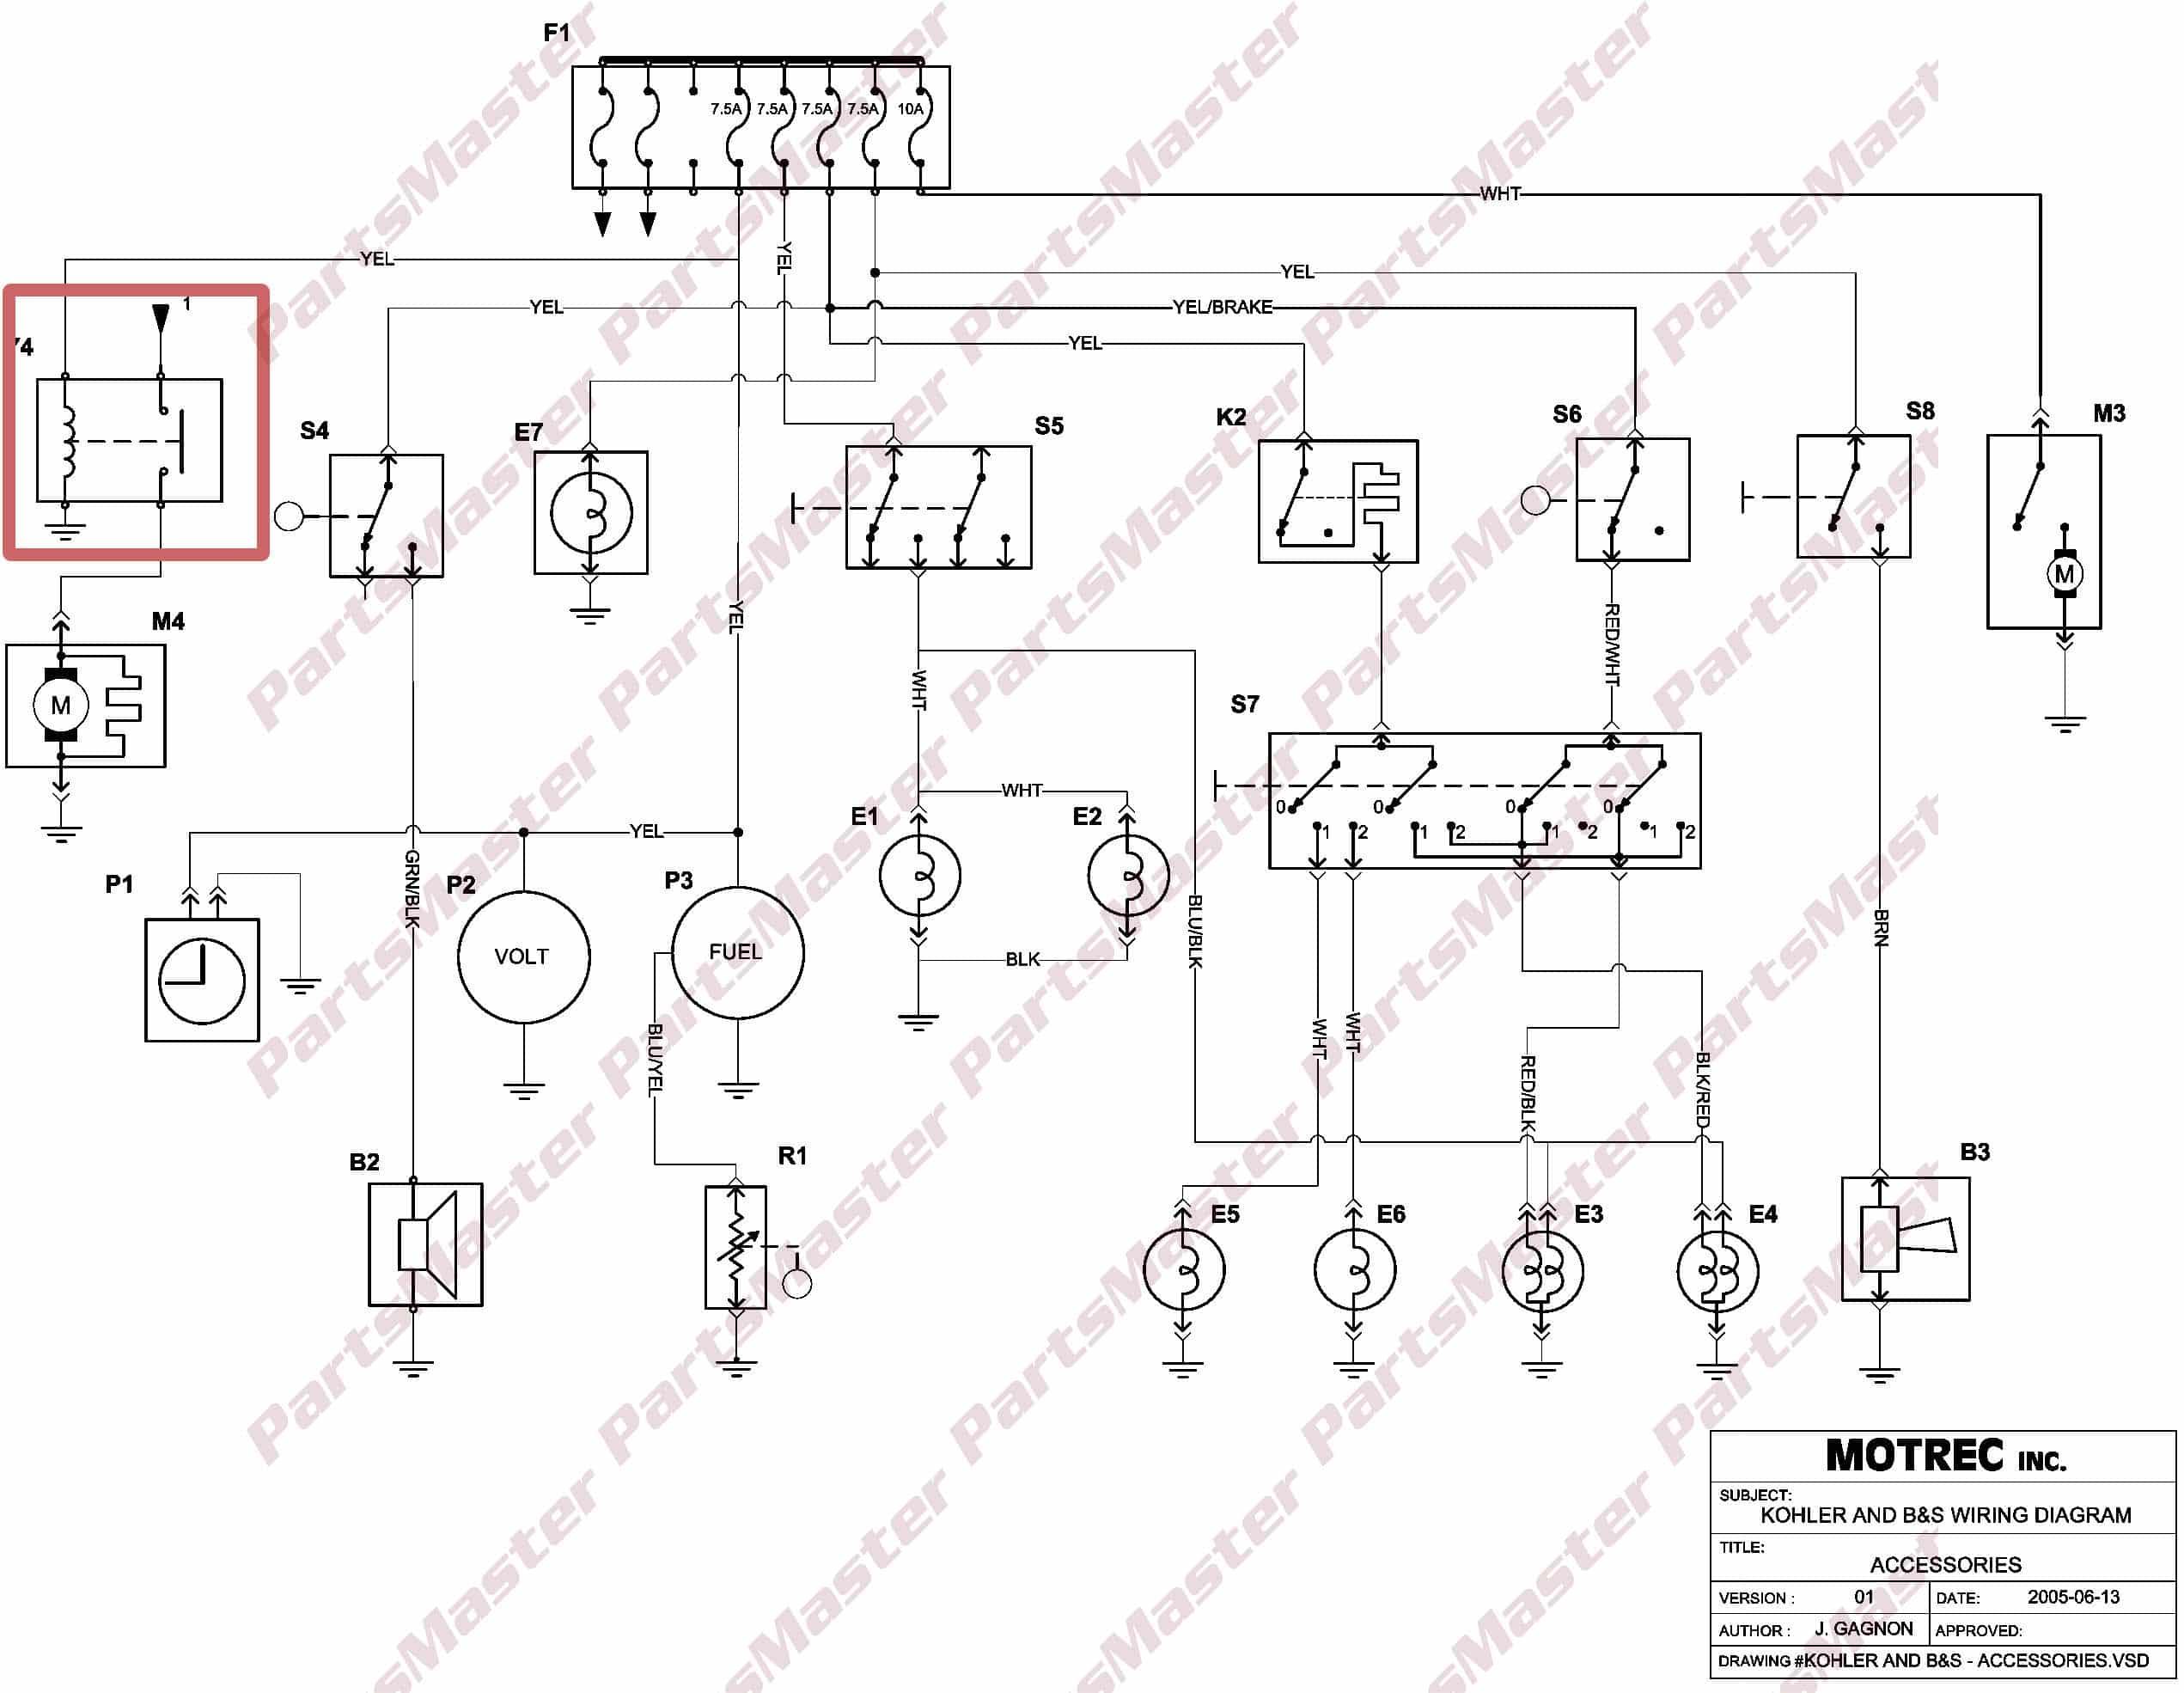 Motrec Wiring Diagram | Wiring Diagram on